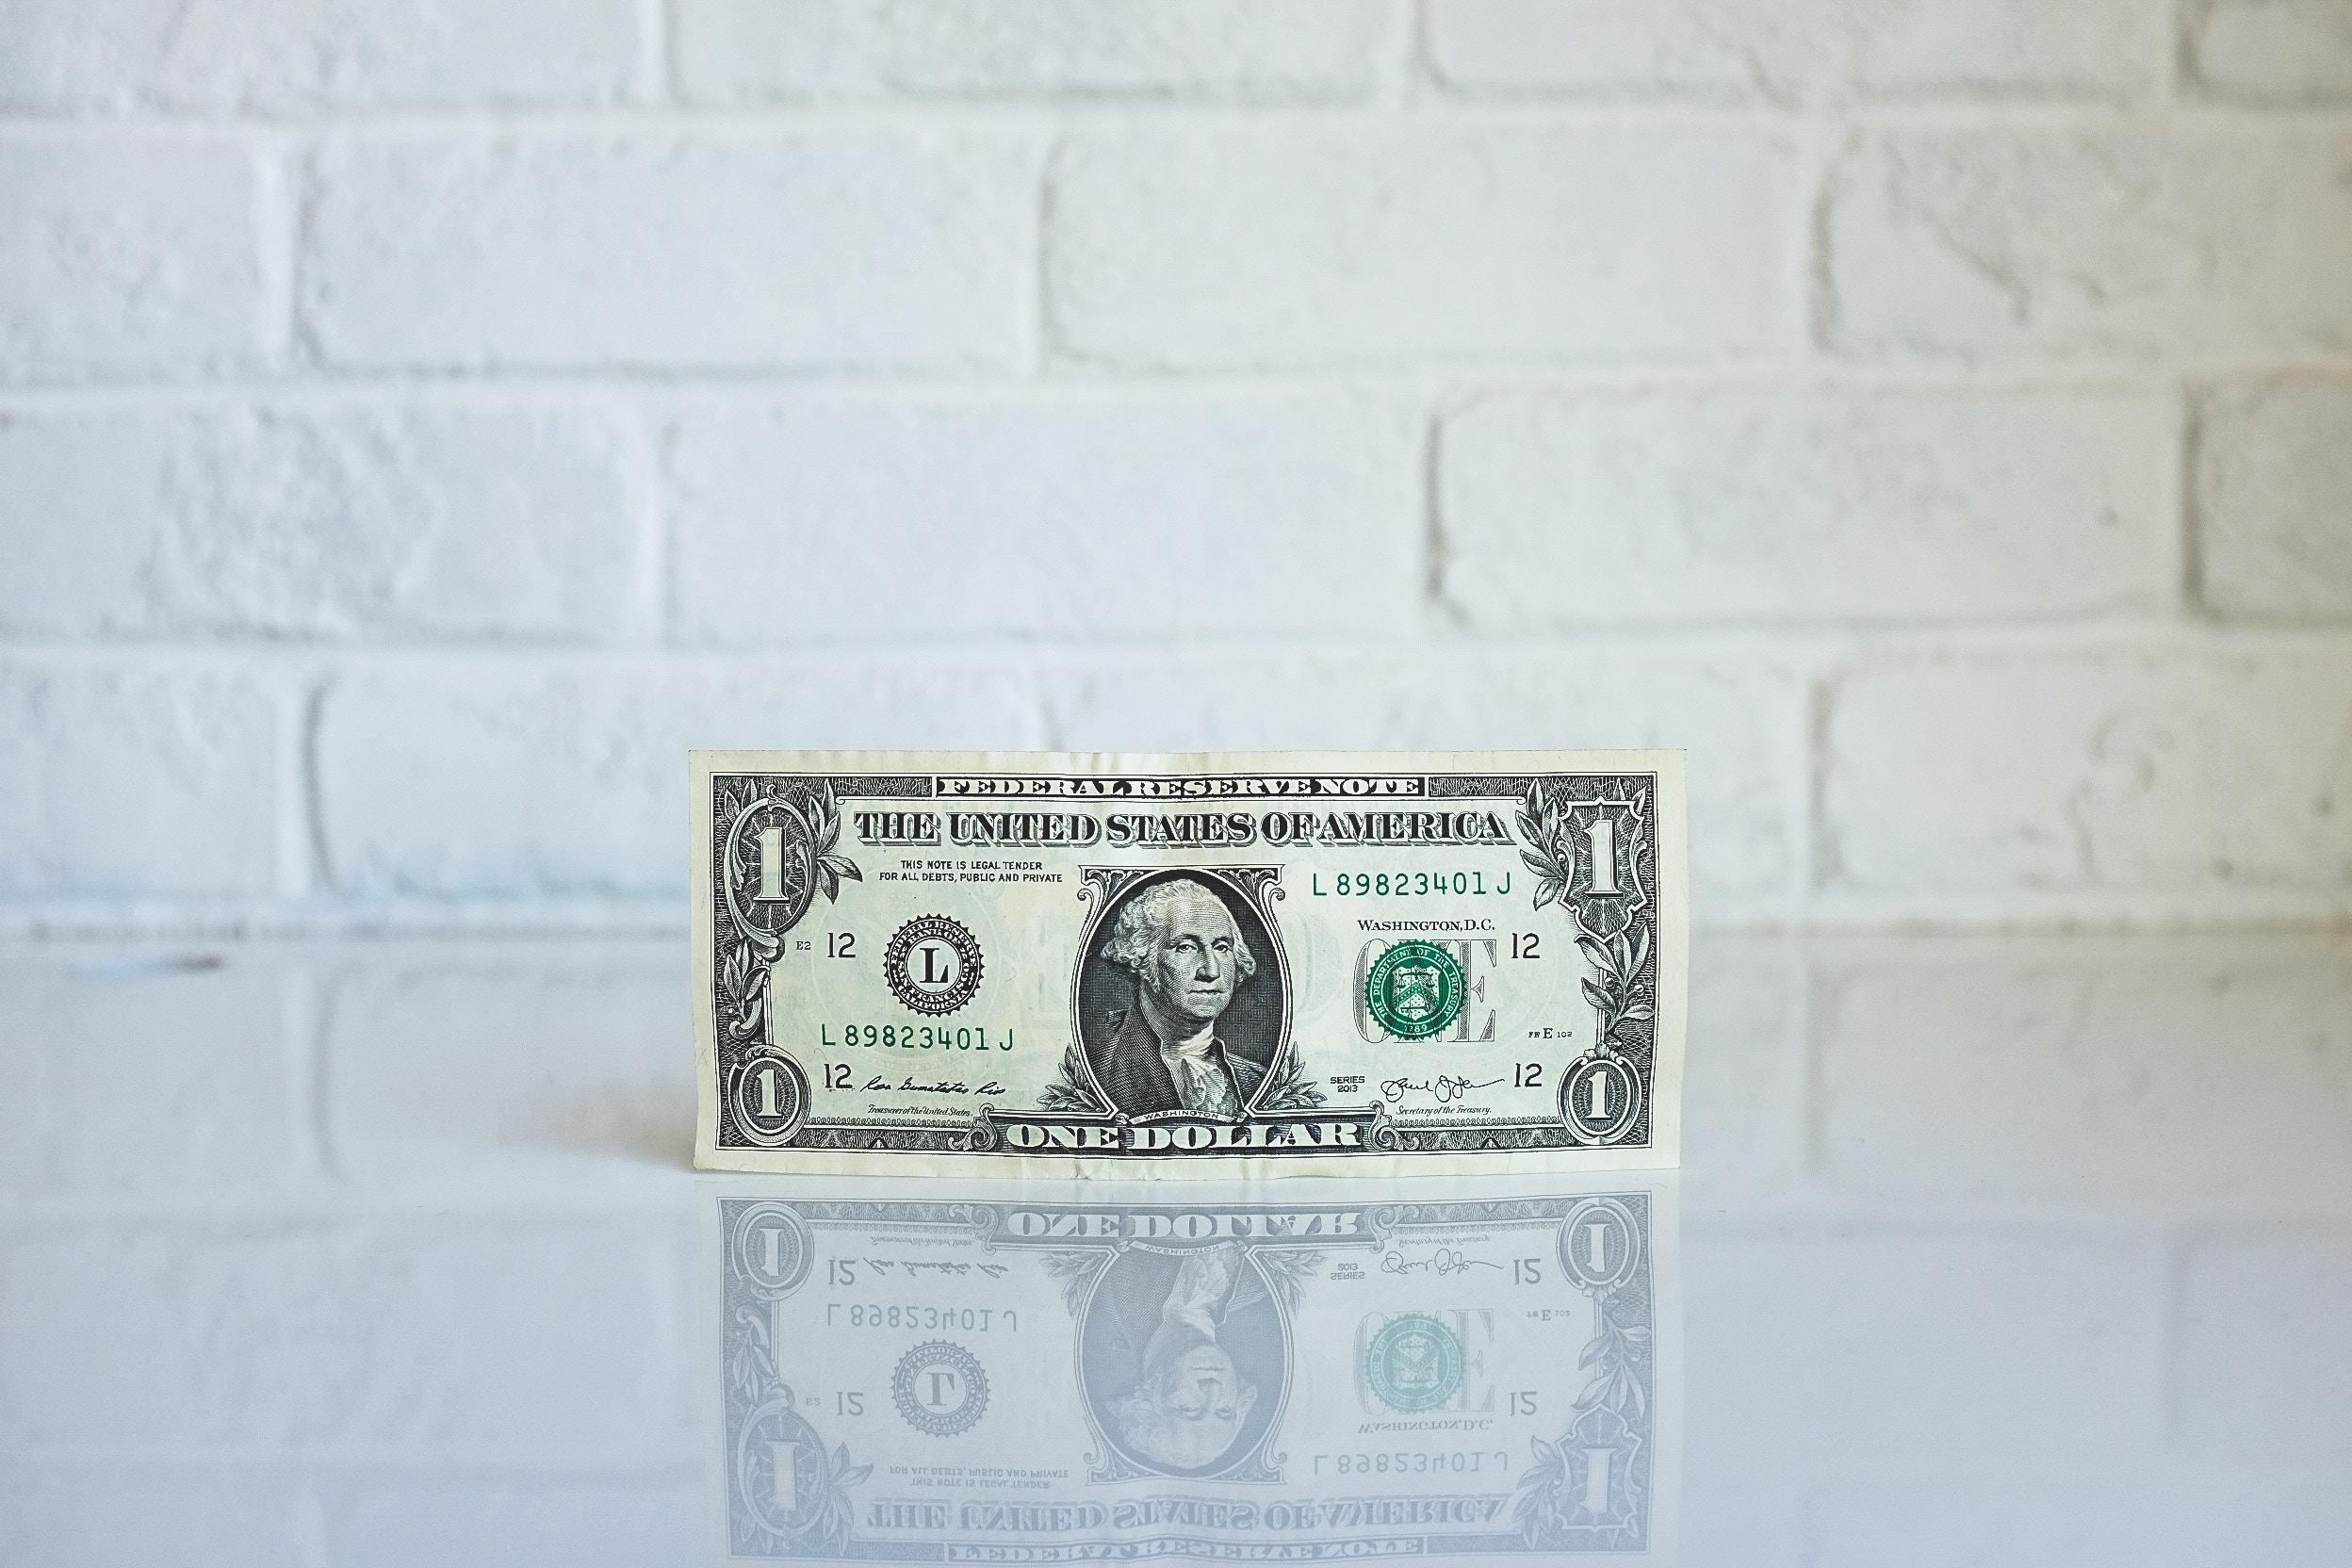 Storyteller marketing saves you money in the long run. (Photo credit: Neonbrand via Unsplash)